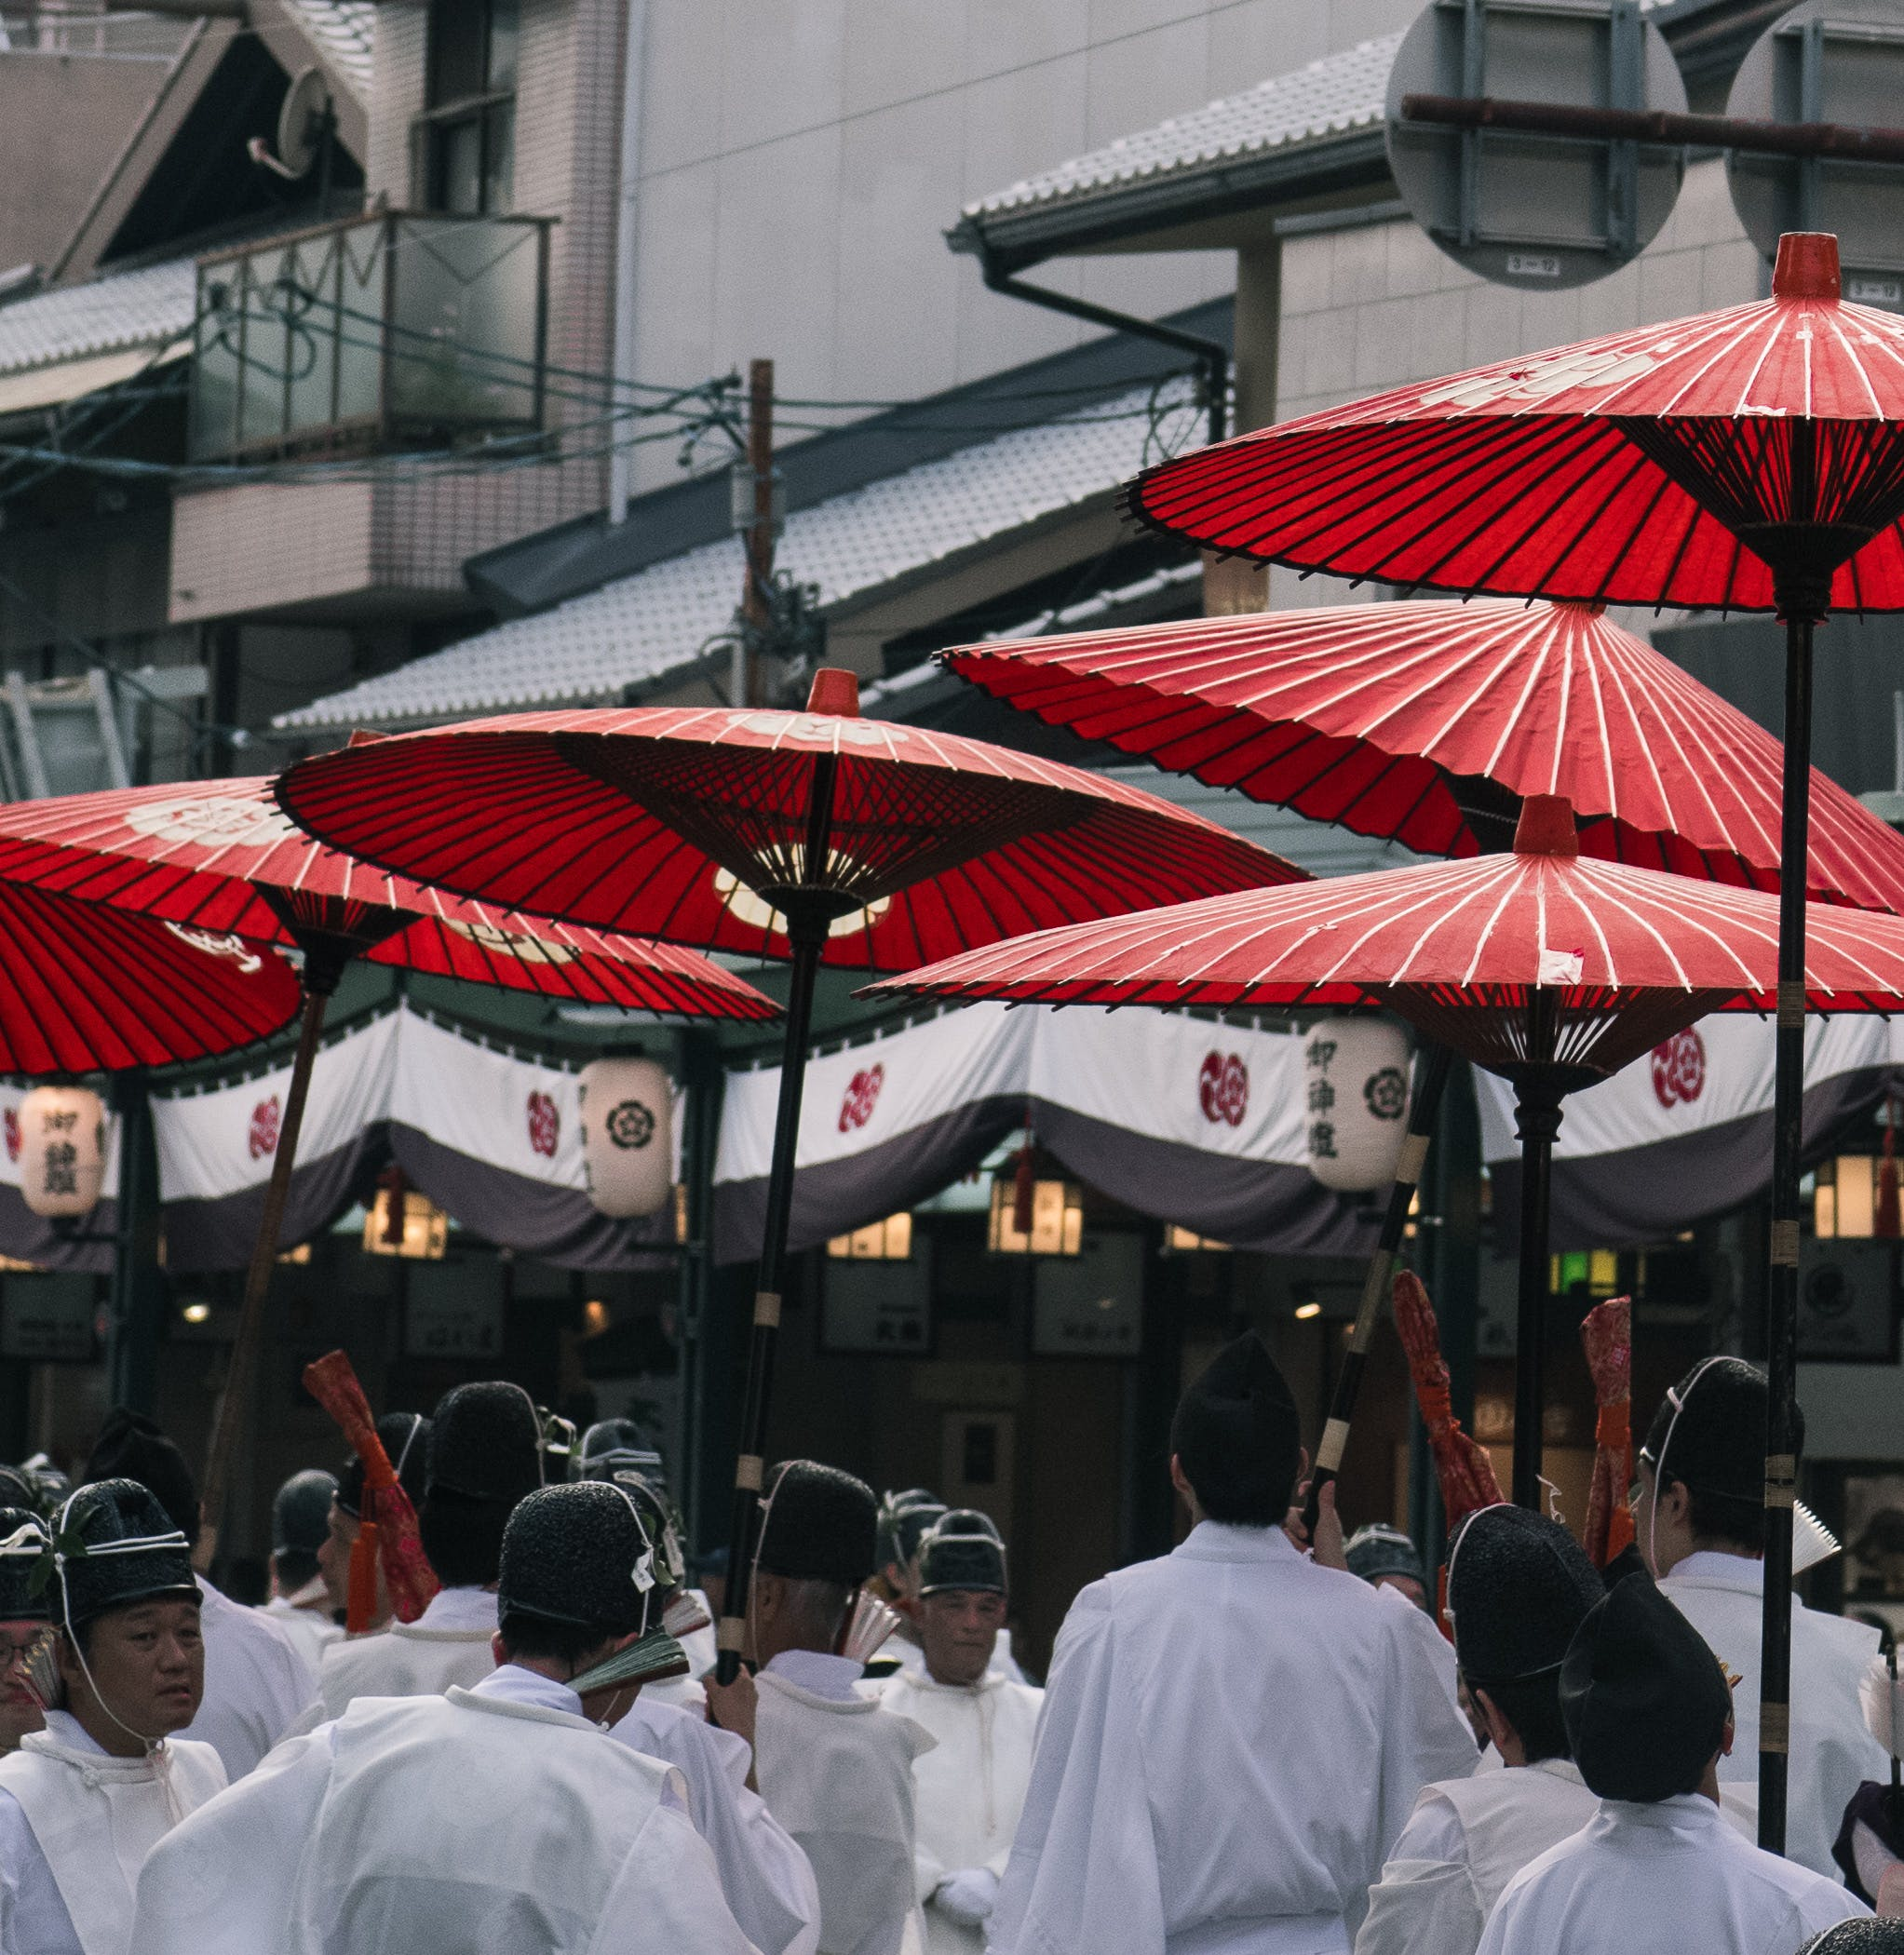 People Under Red Umbrellas